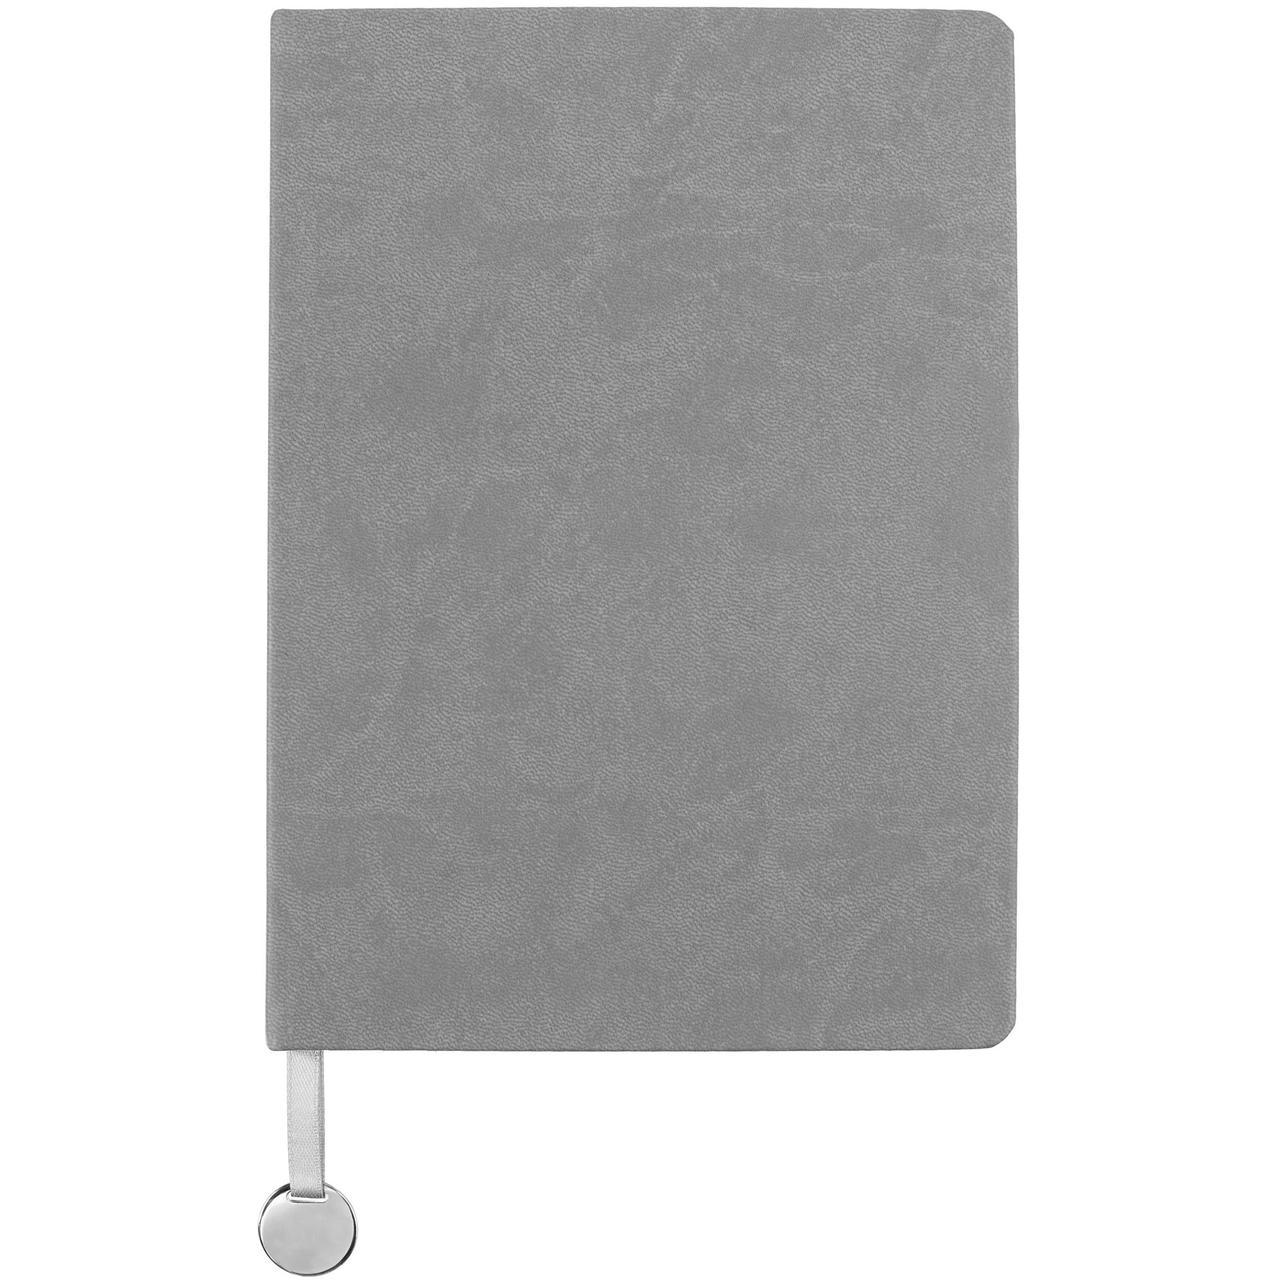 Ежедневник Exact, недатированный, серый (артикул 7882.10)